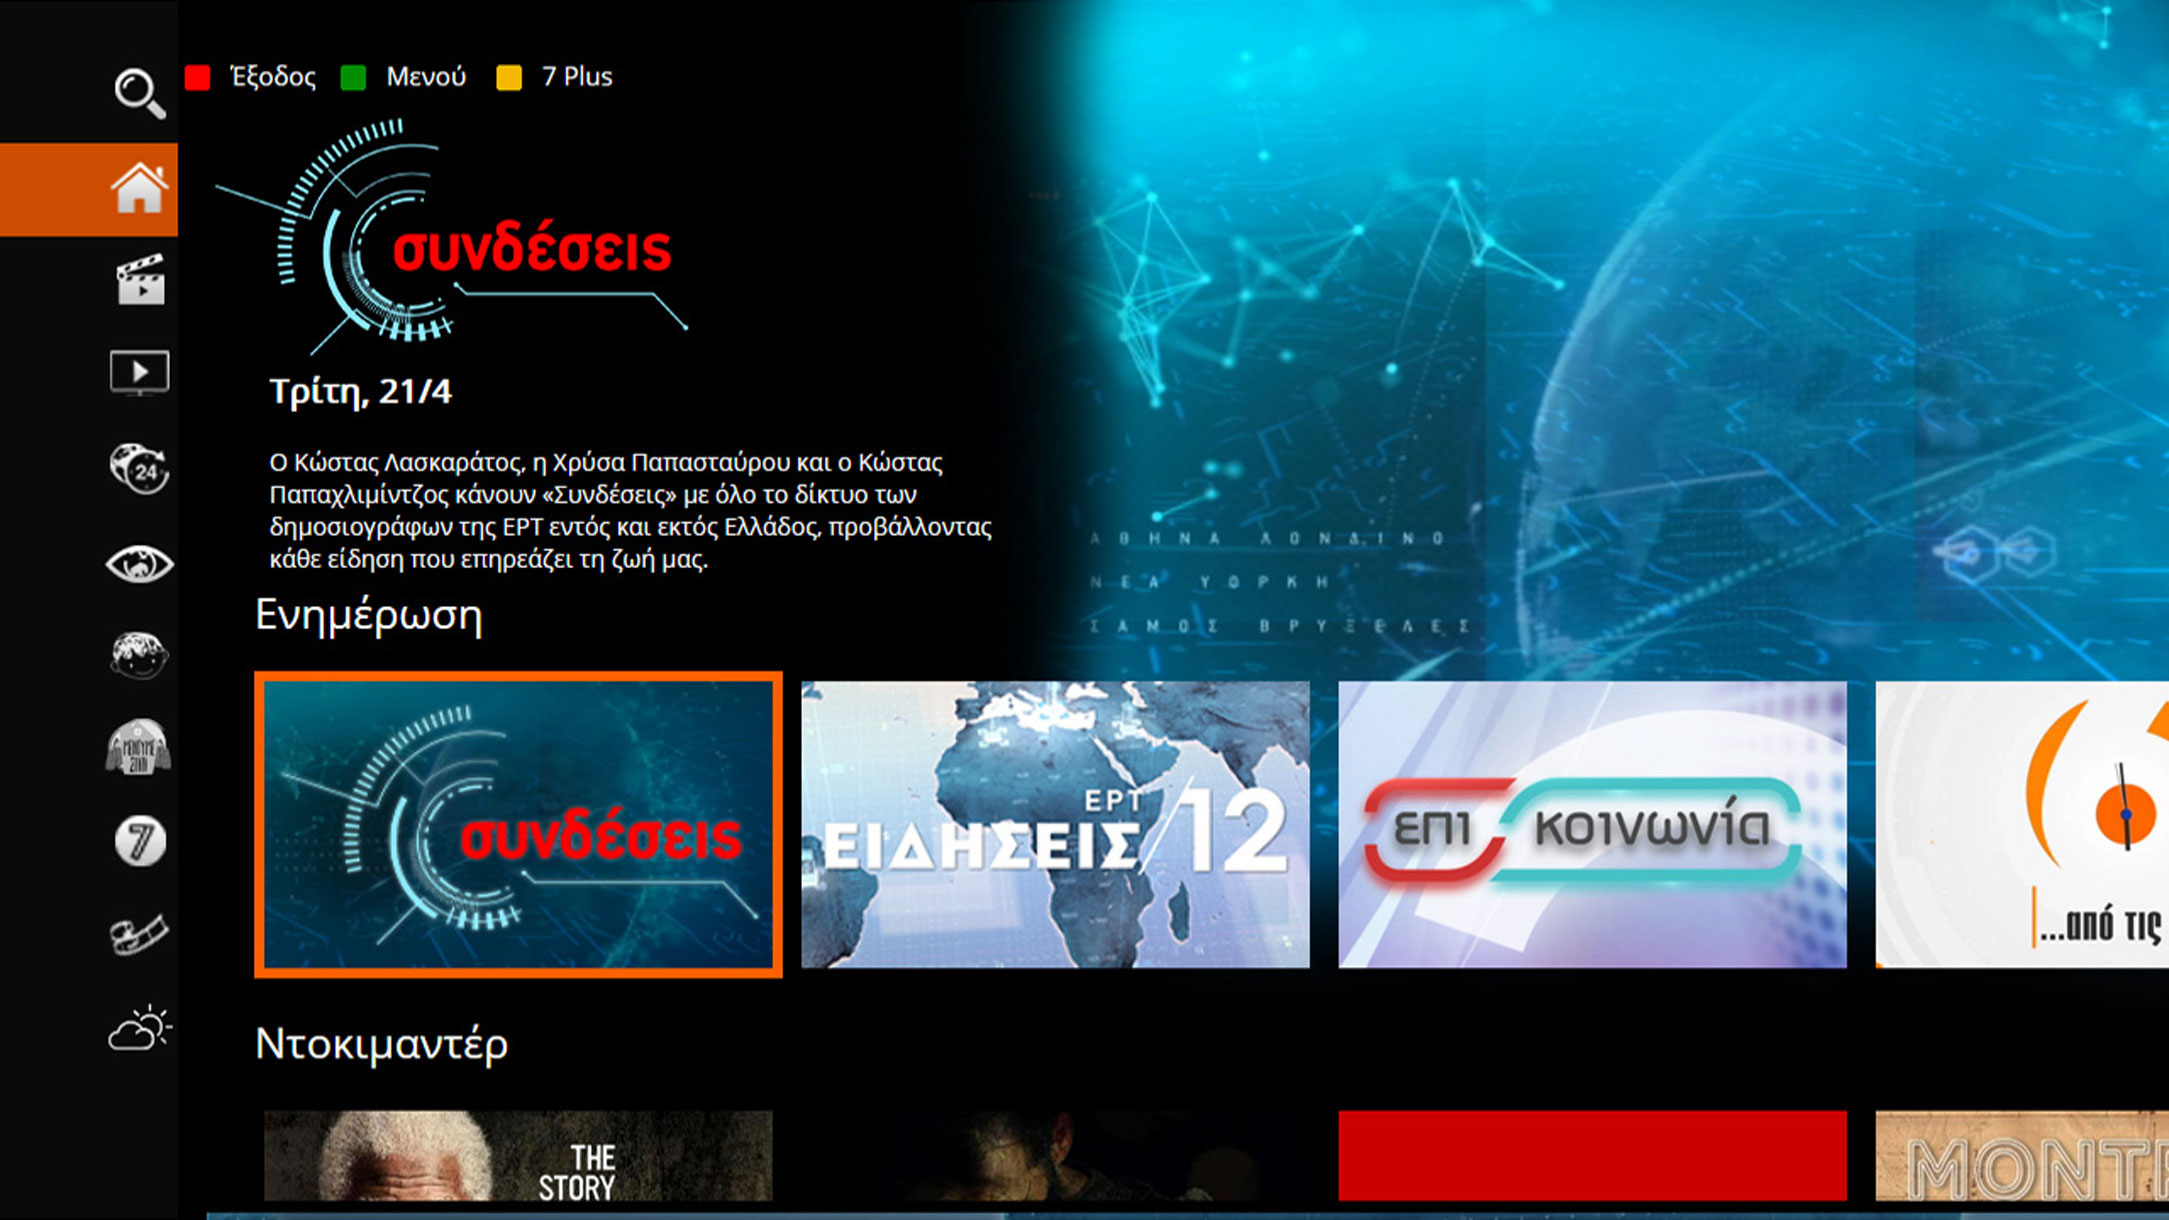 EΡΤ και Samsung διευκολύνουν την πρόσβαση στο ERTFLIX (video)